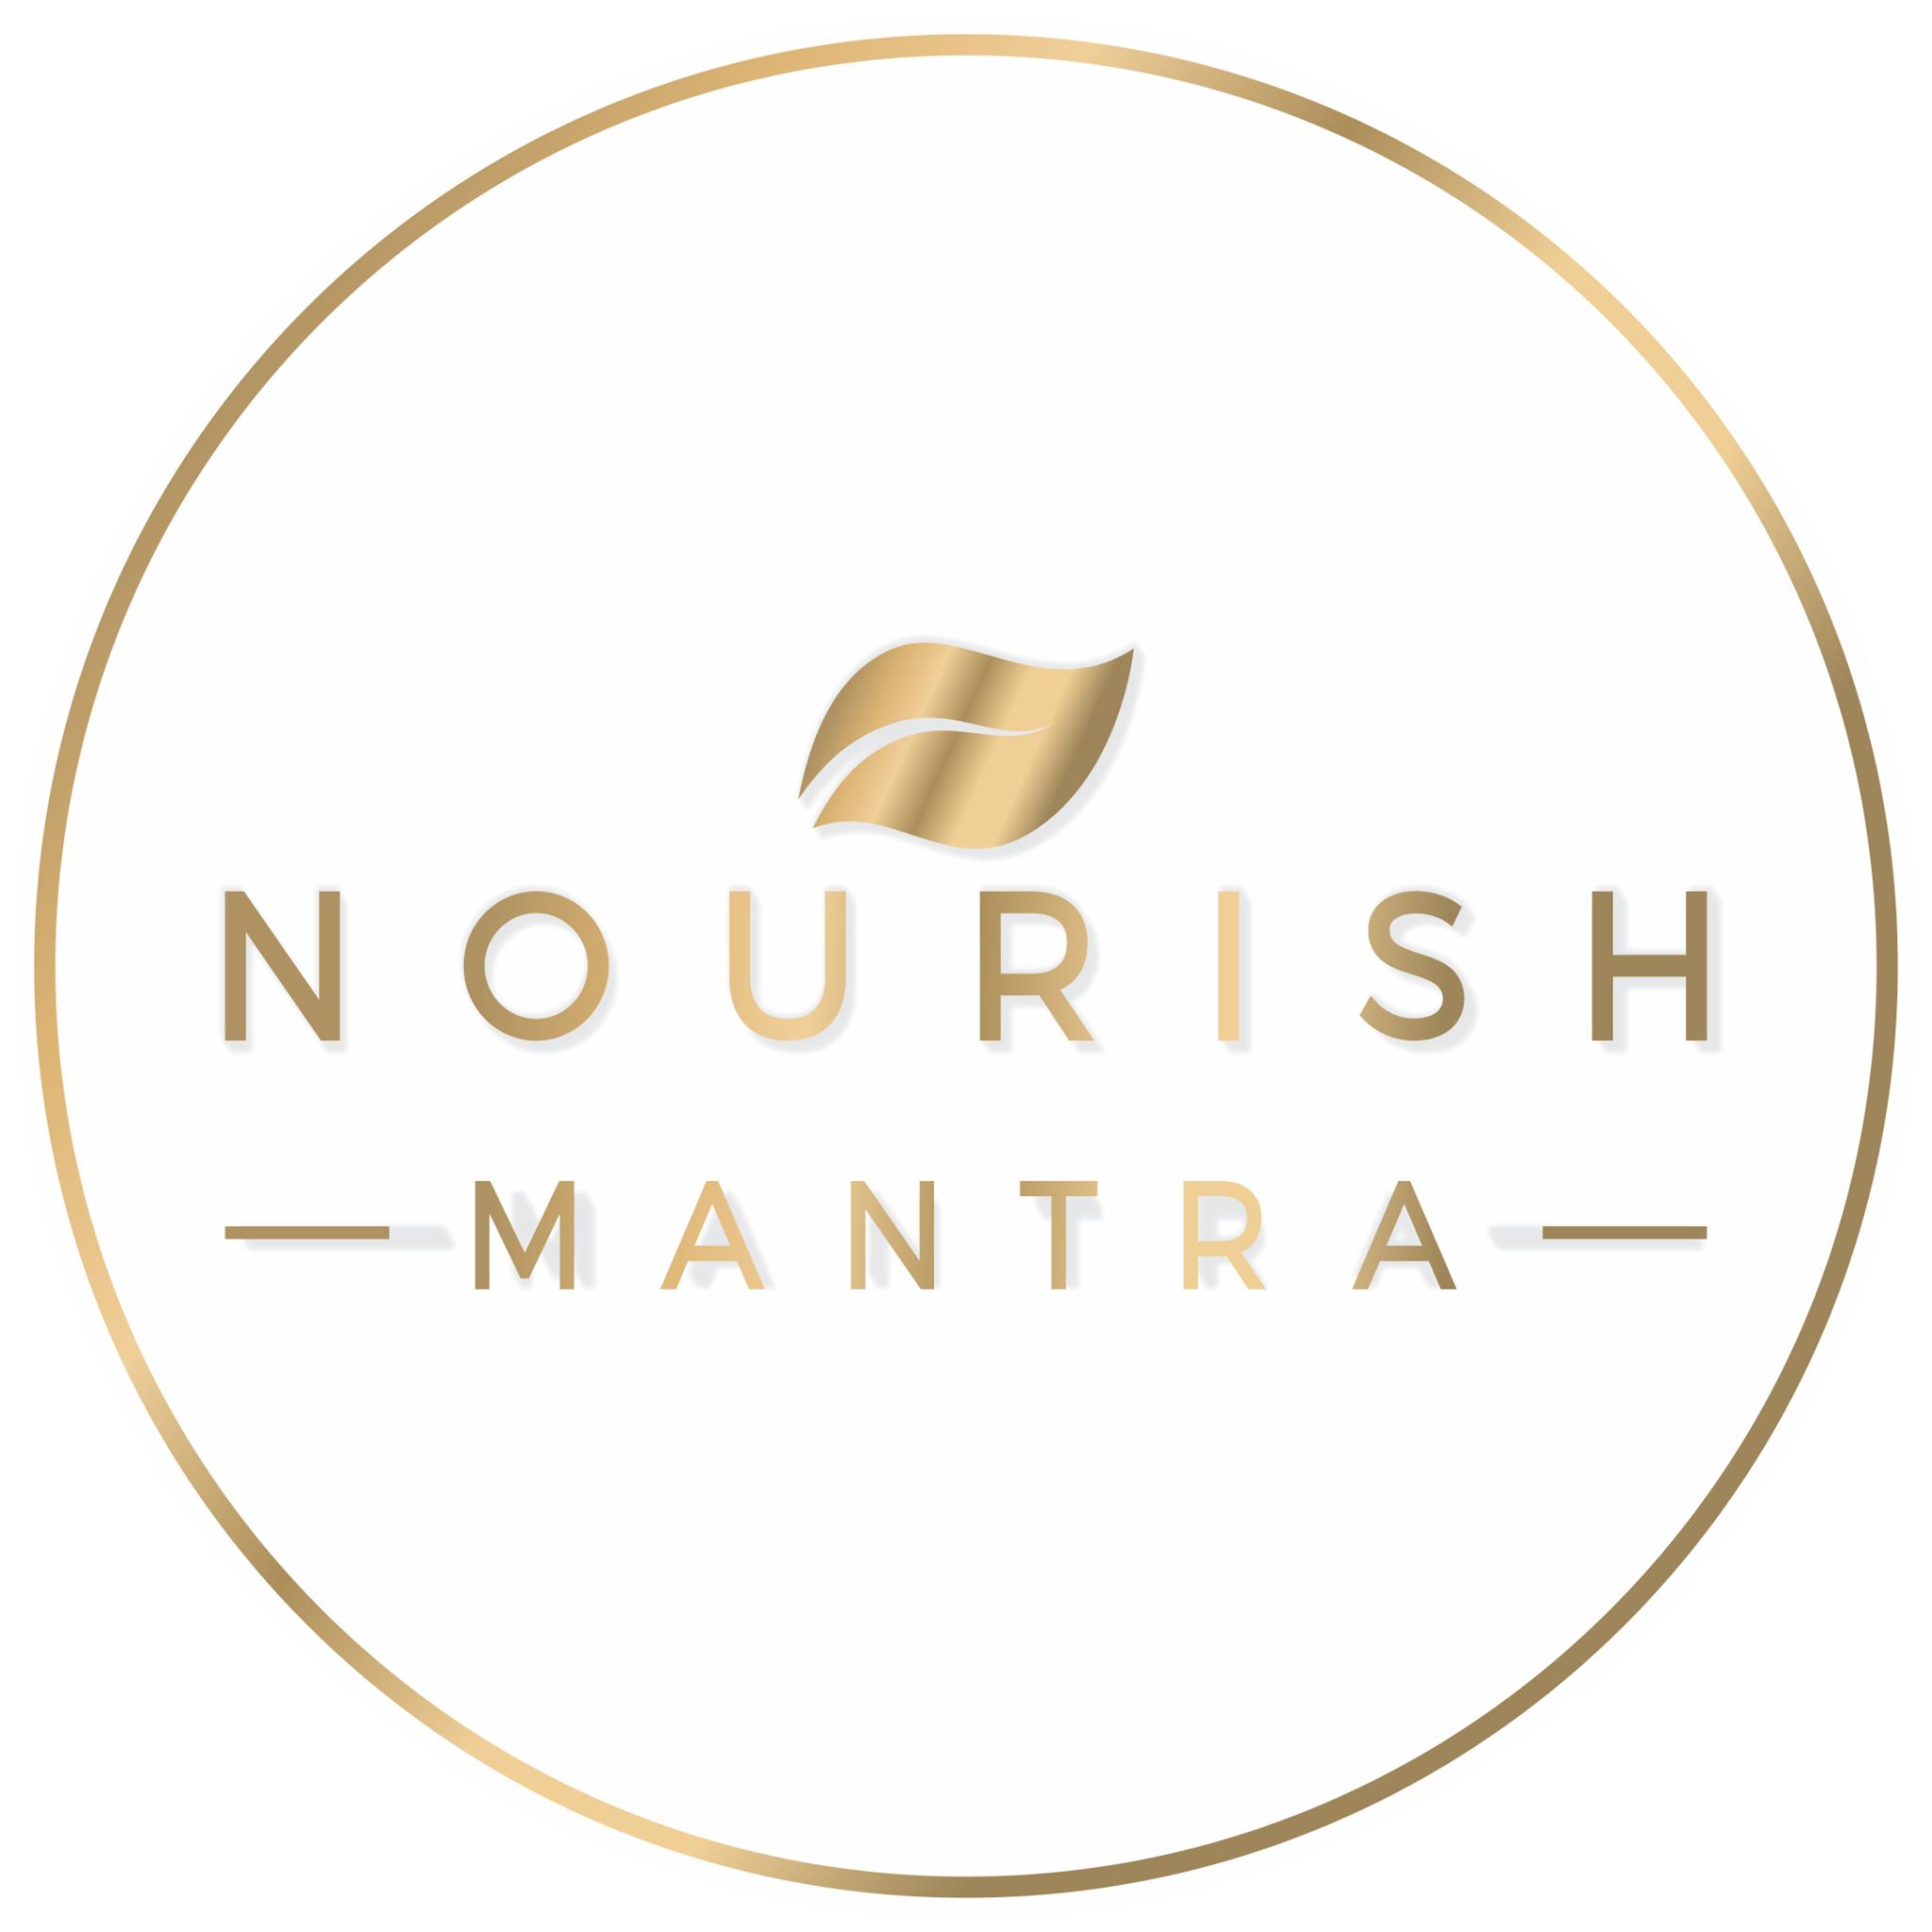 Nourish Mantra